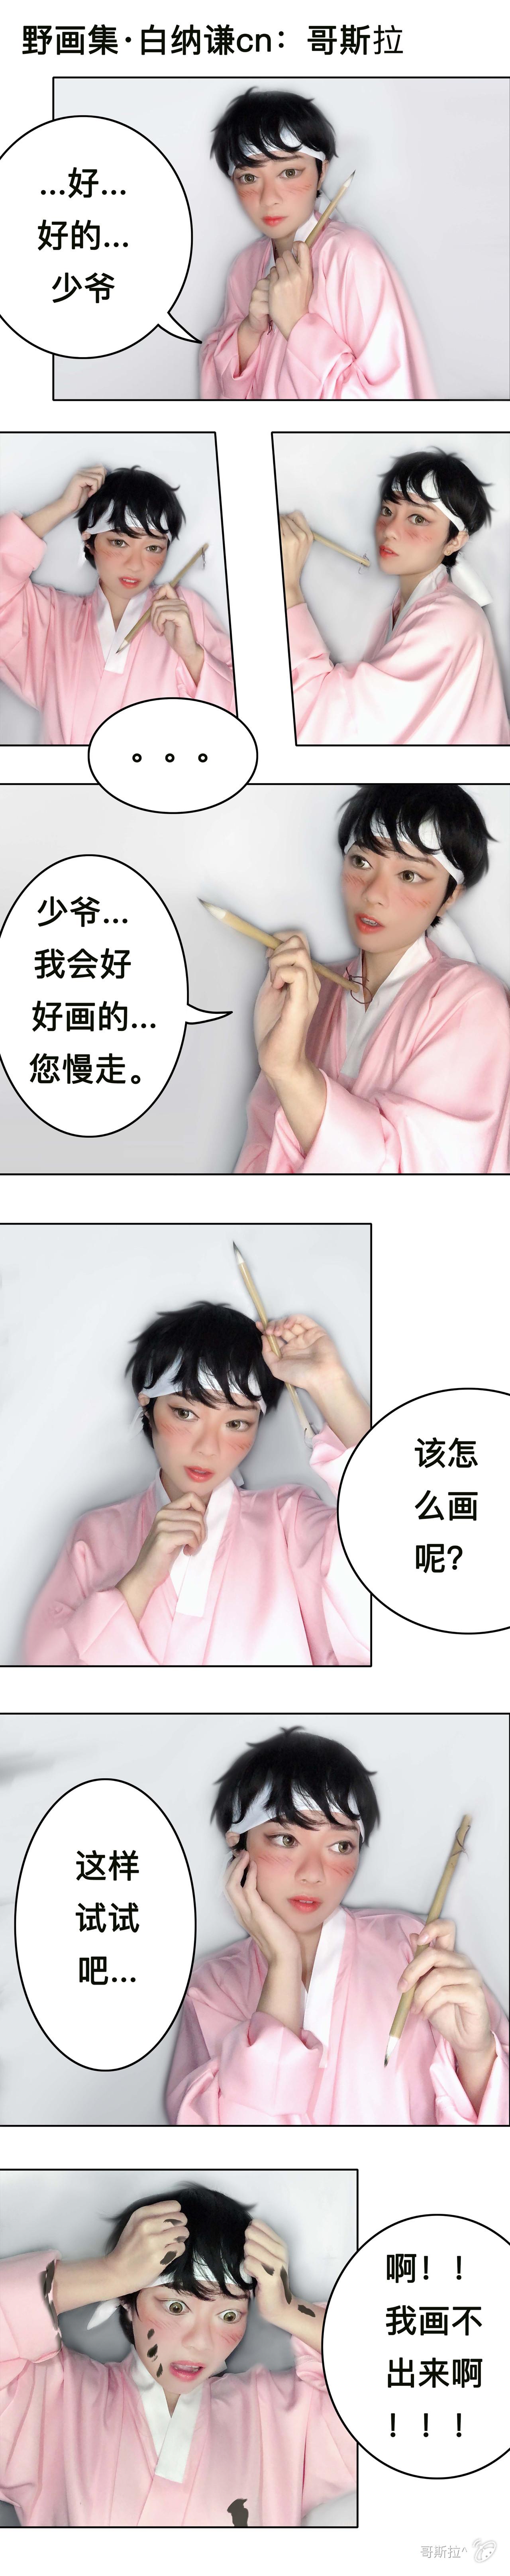 【剧情cos】野画集